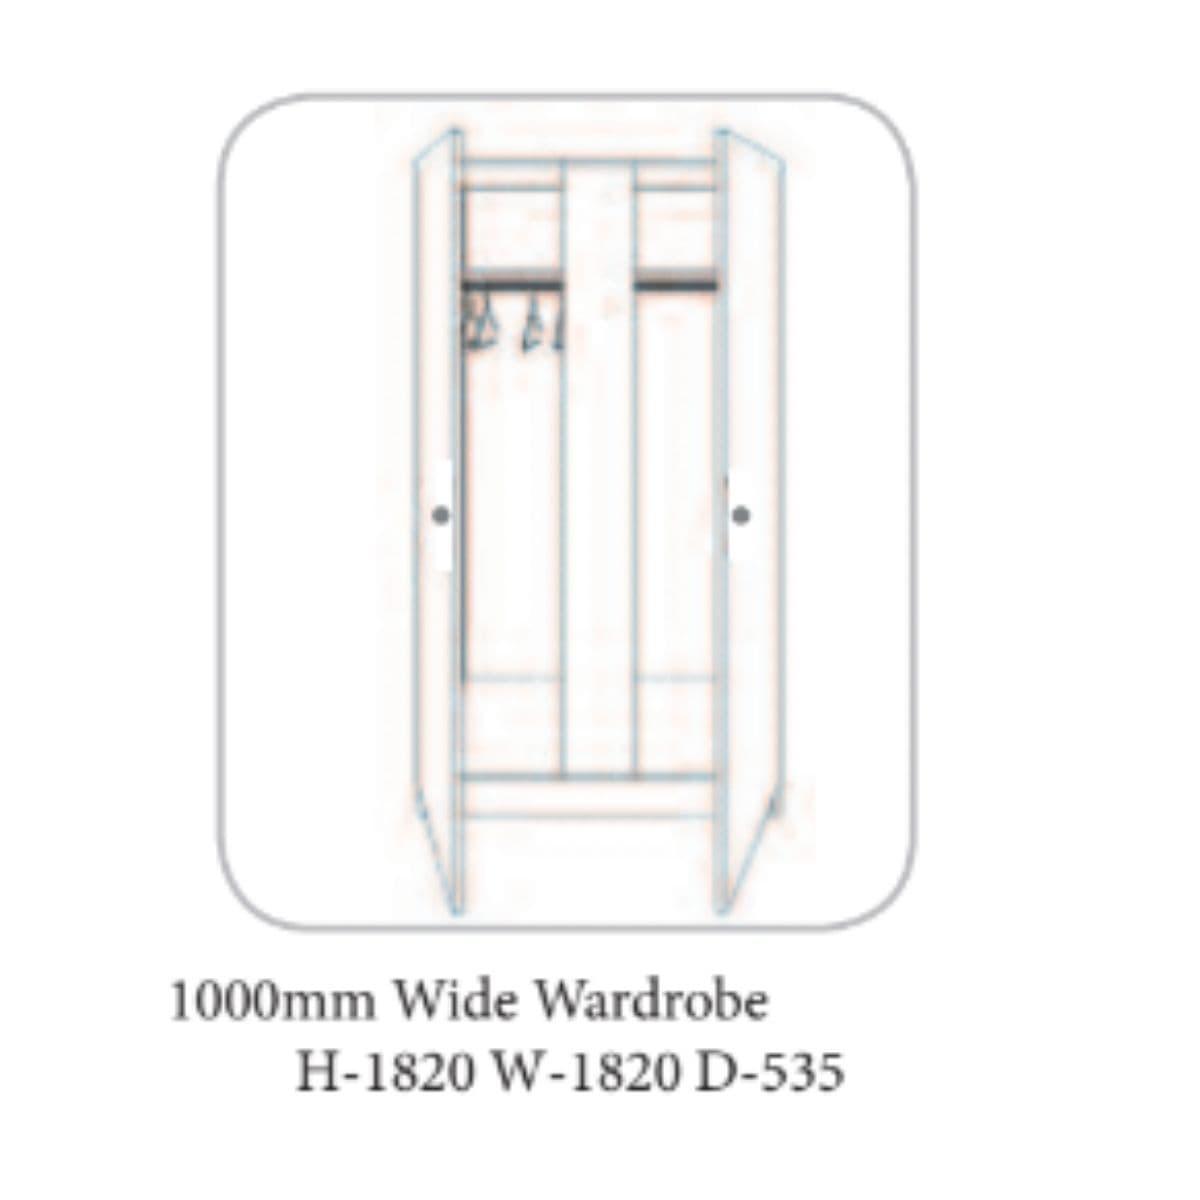 Bandon Wardrobe Walnut - 19 Options